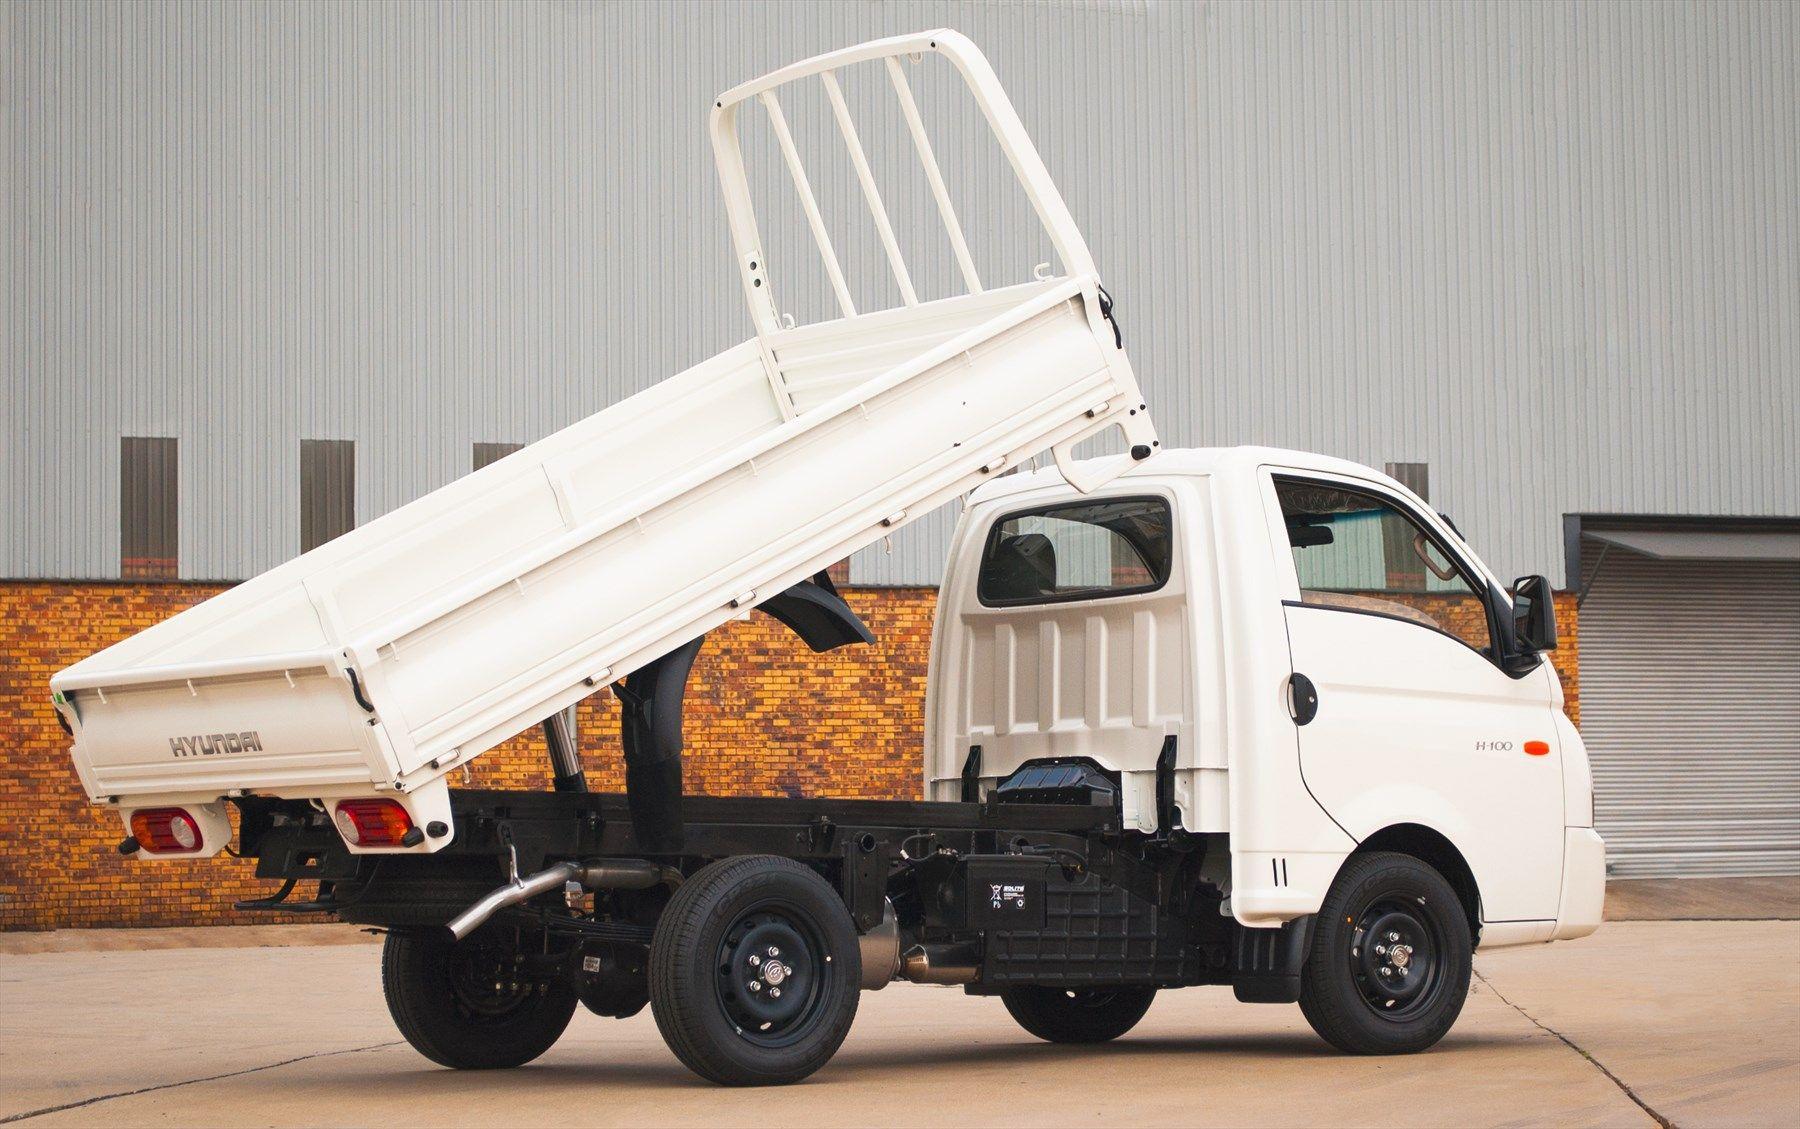 049e2ccc7a Versatile Hyundai H100 Tipper makes light work of a heavy load ...